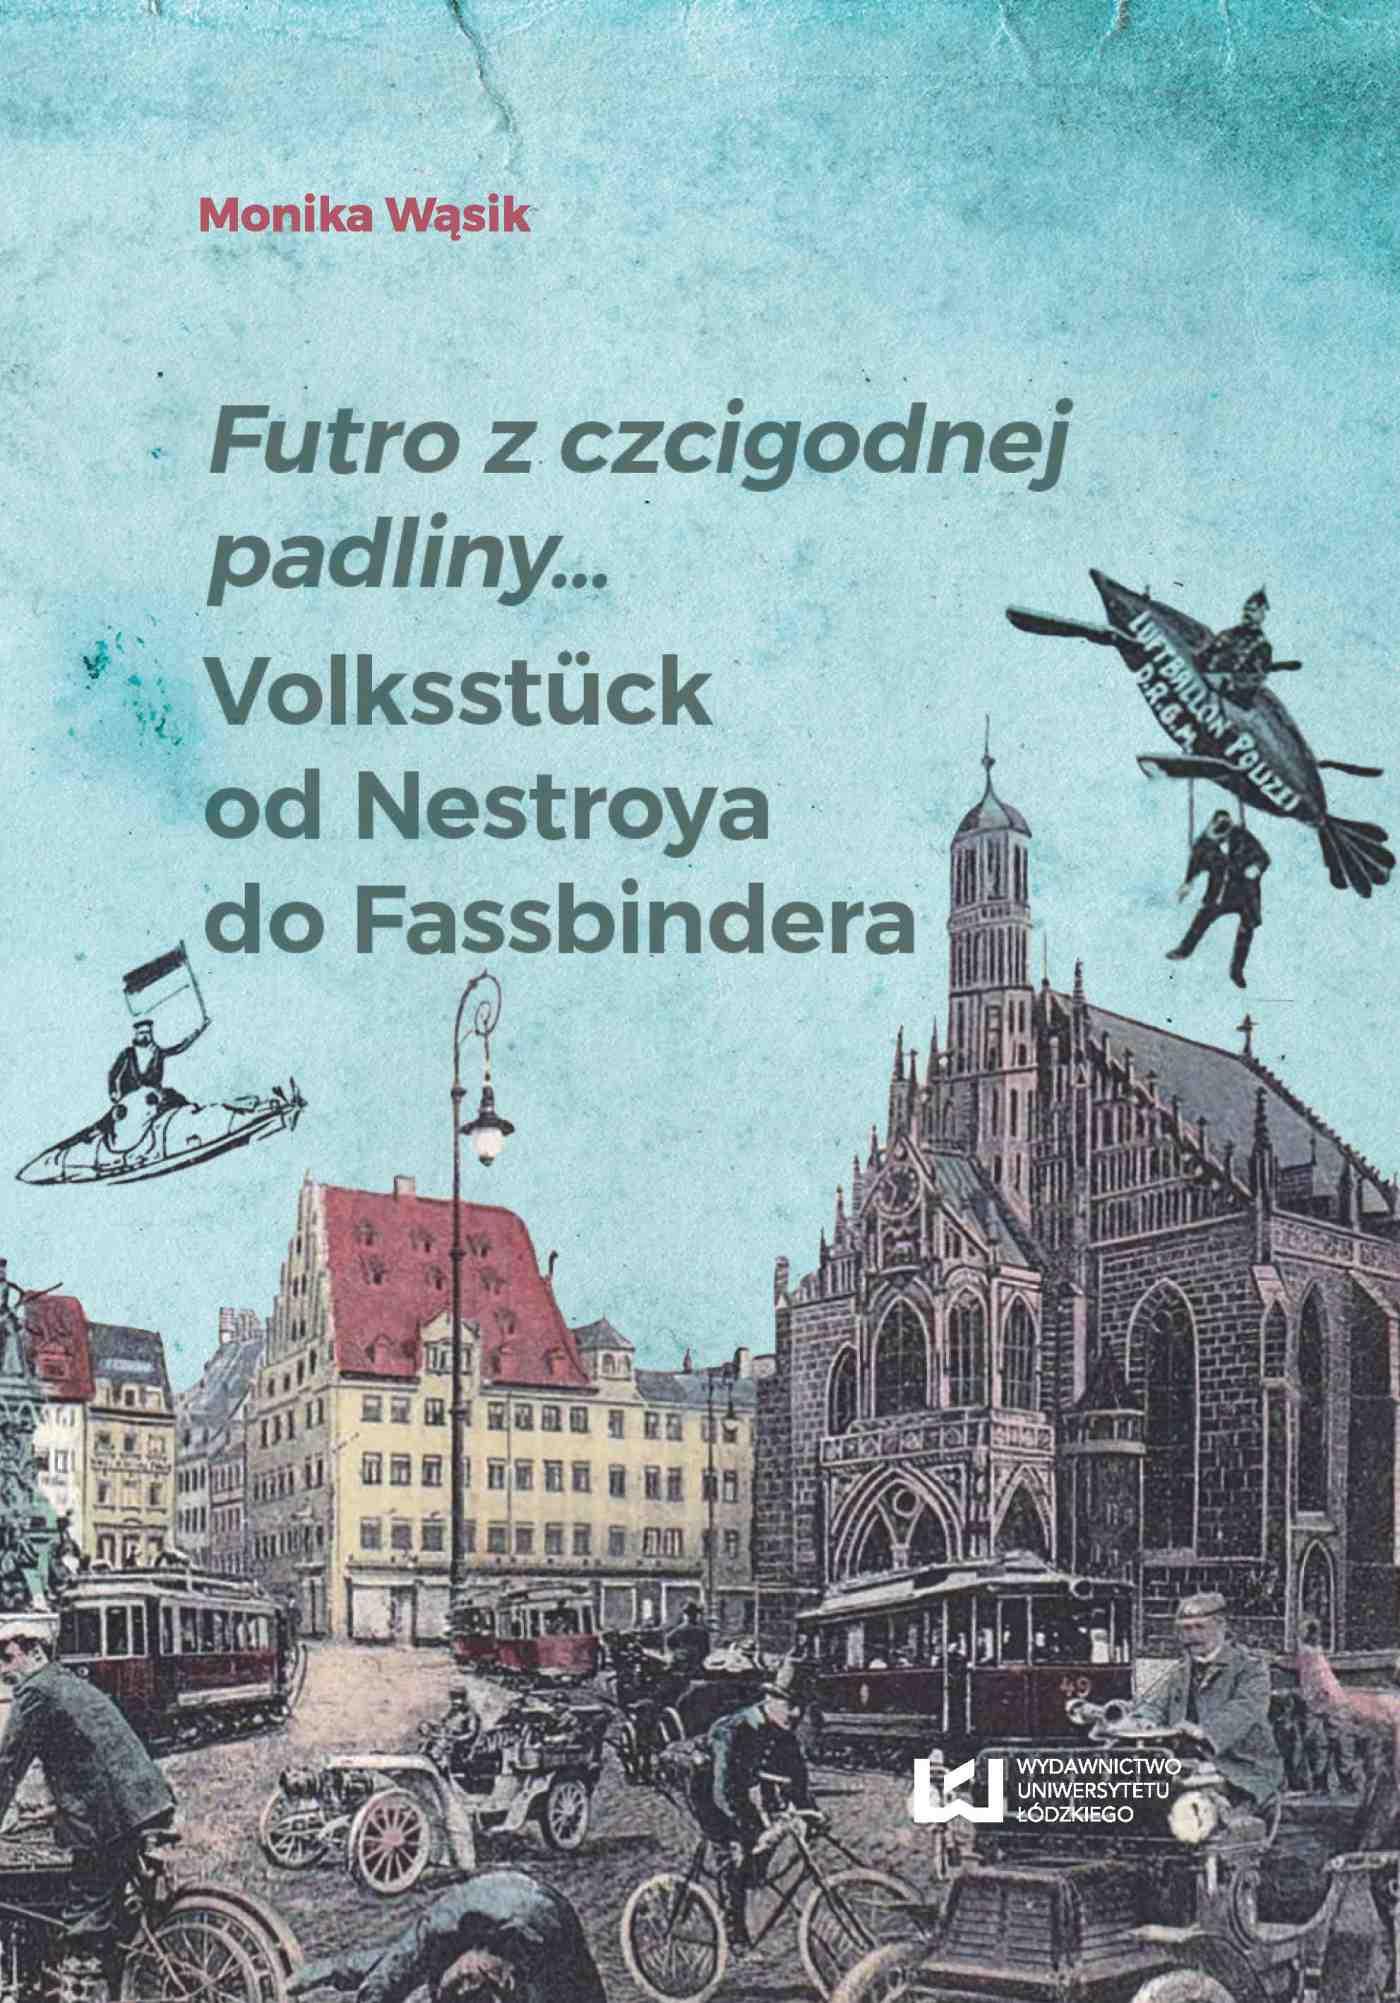 Futro z czcigodnej padliny… Volksstück od Nestroya do Fassbindera - Ebook (Książka PDF) do pobrania w formacie PDF